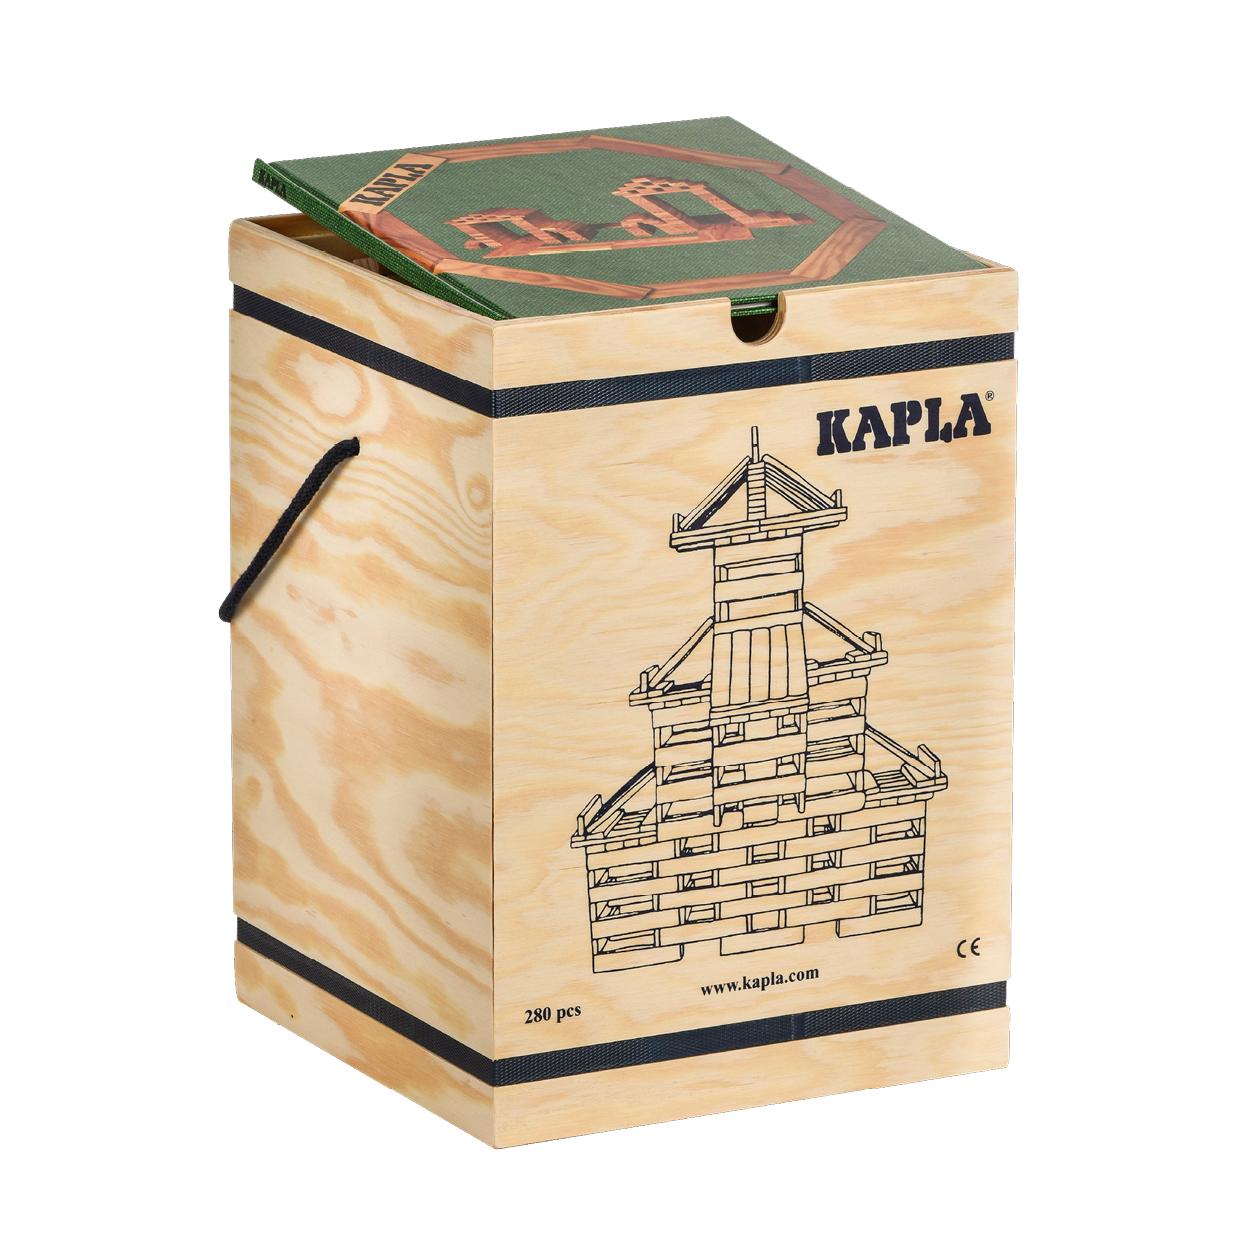 FAP-K-280-G-KAPLA280 積木盒-#3-綠 (280PCS)